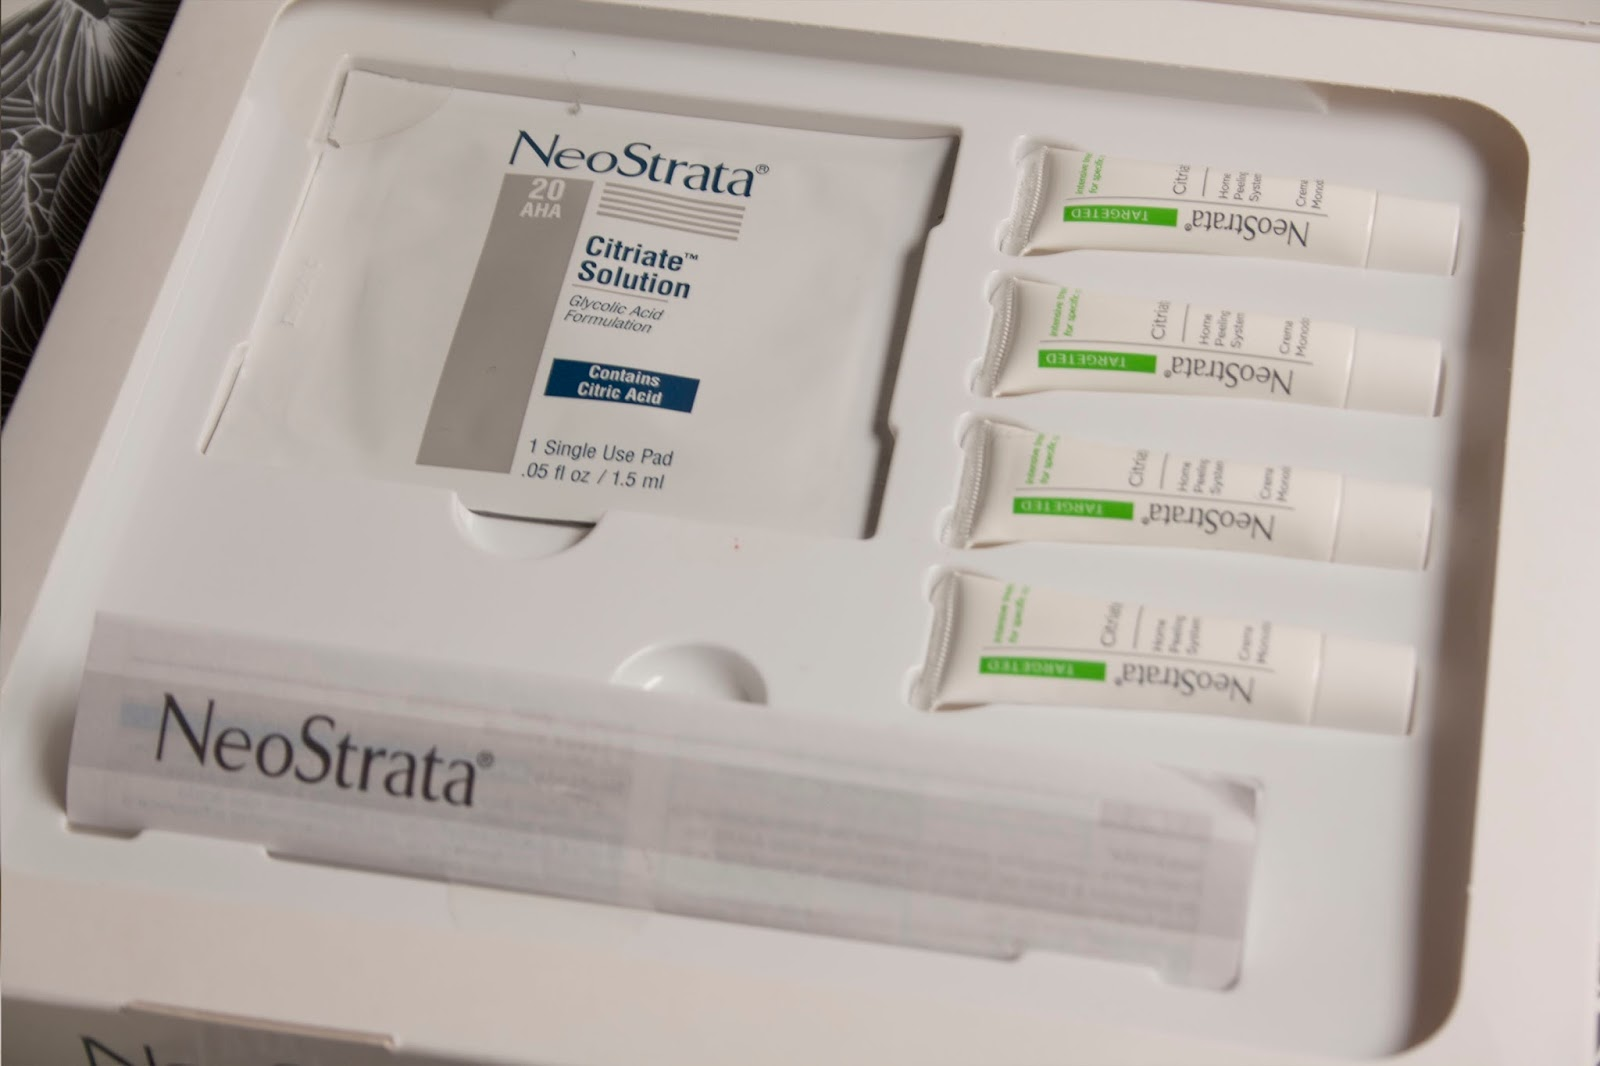 Neostrata Citriate Home Peeling System X Units